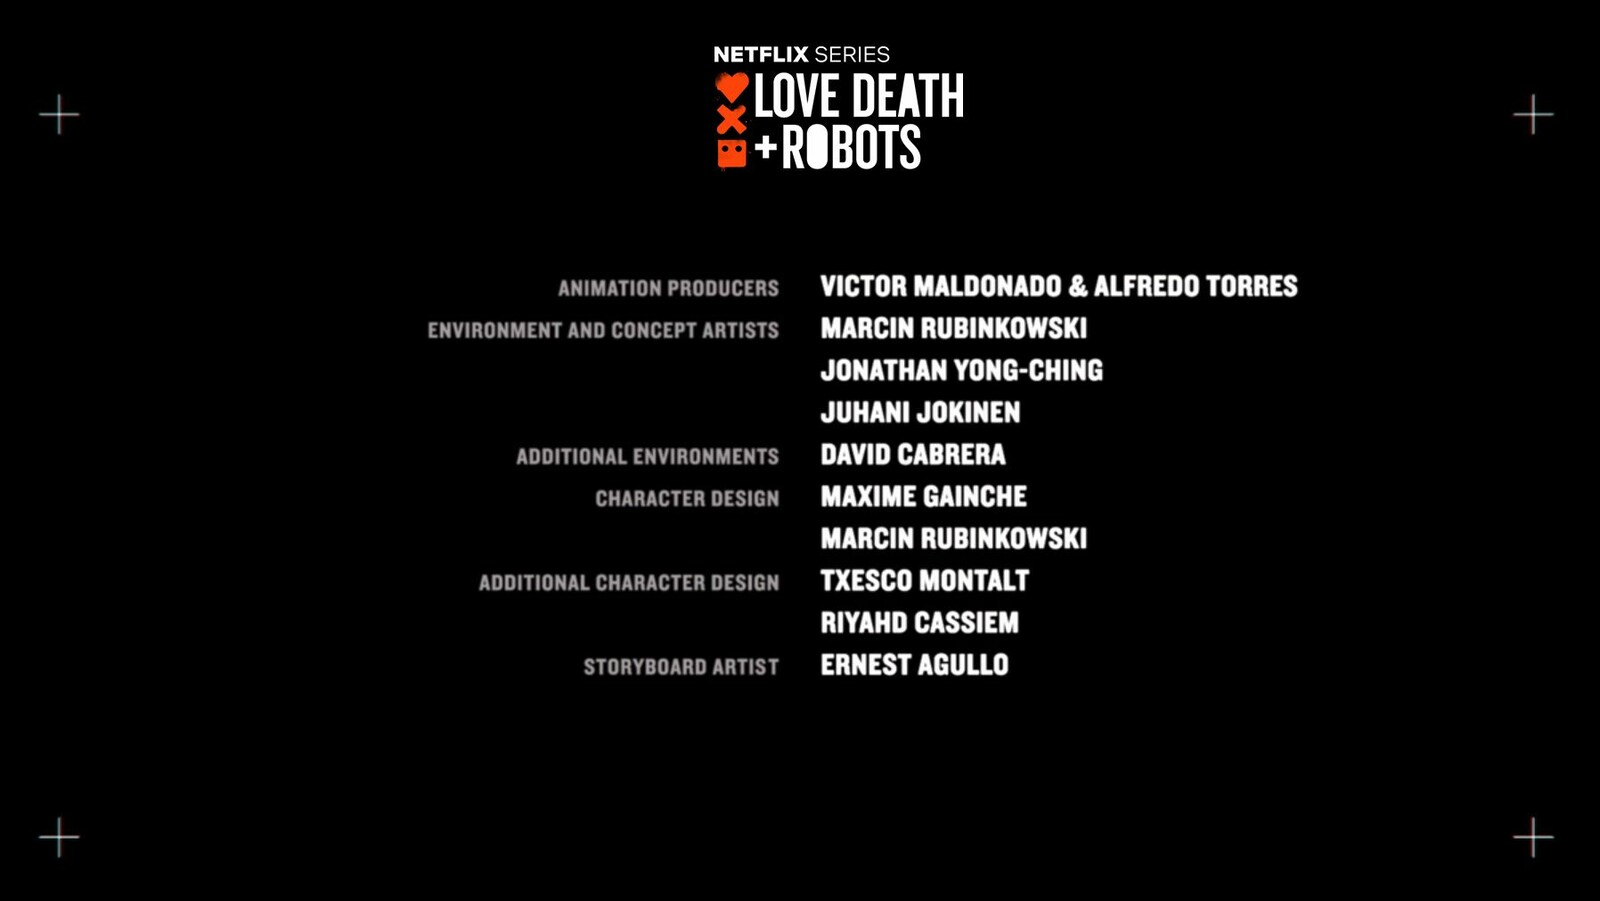 Love Death and Robots - Three Robots credits